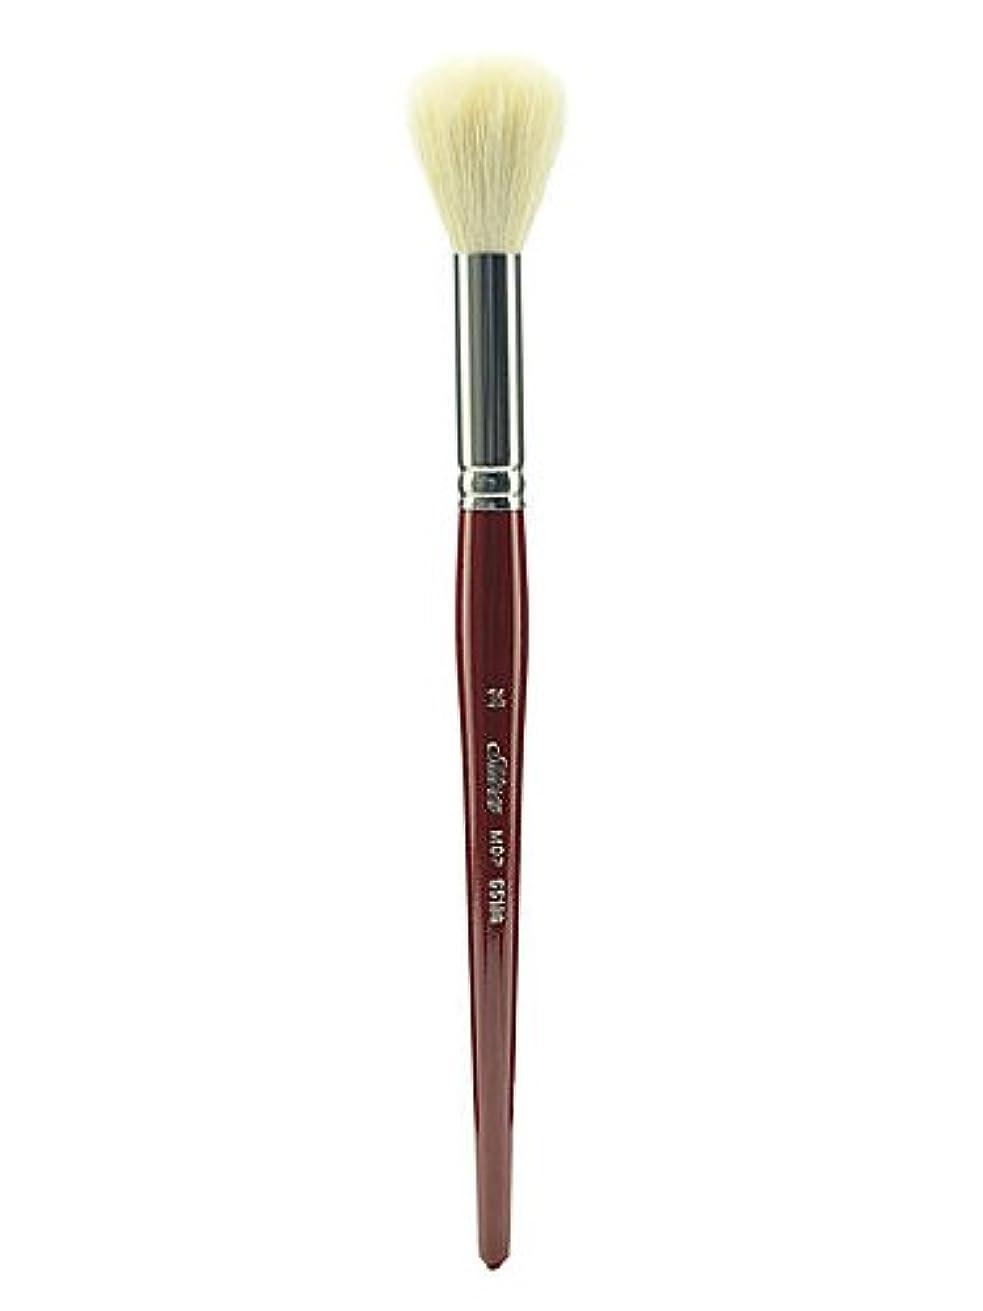 Silver Brush 5518S-14 Silver Mop Short Handle Blender Brush, White Round, Size 14